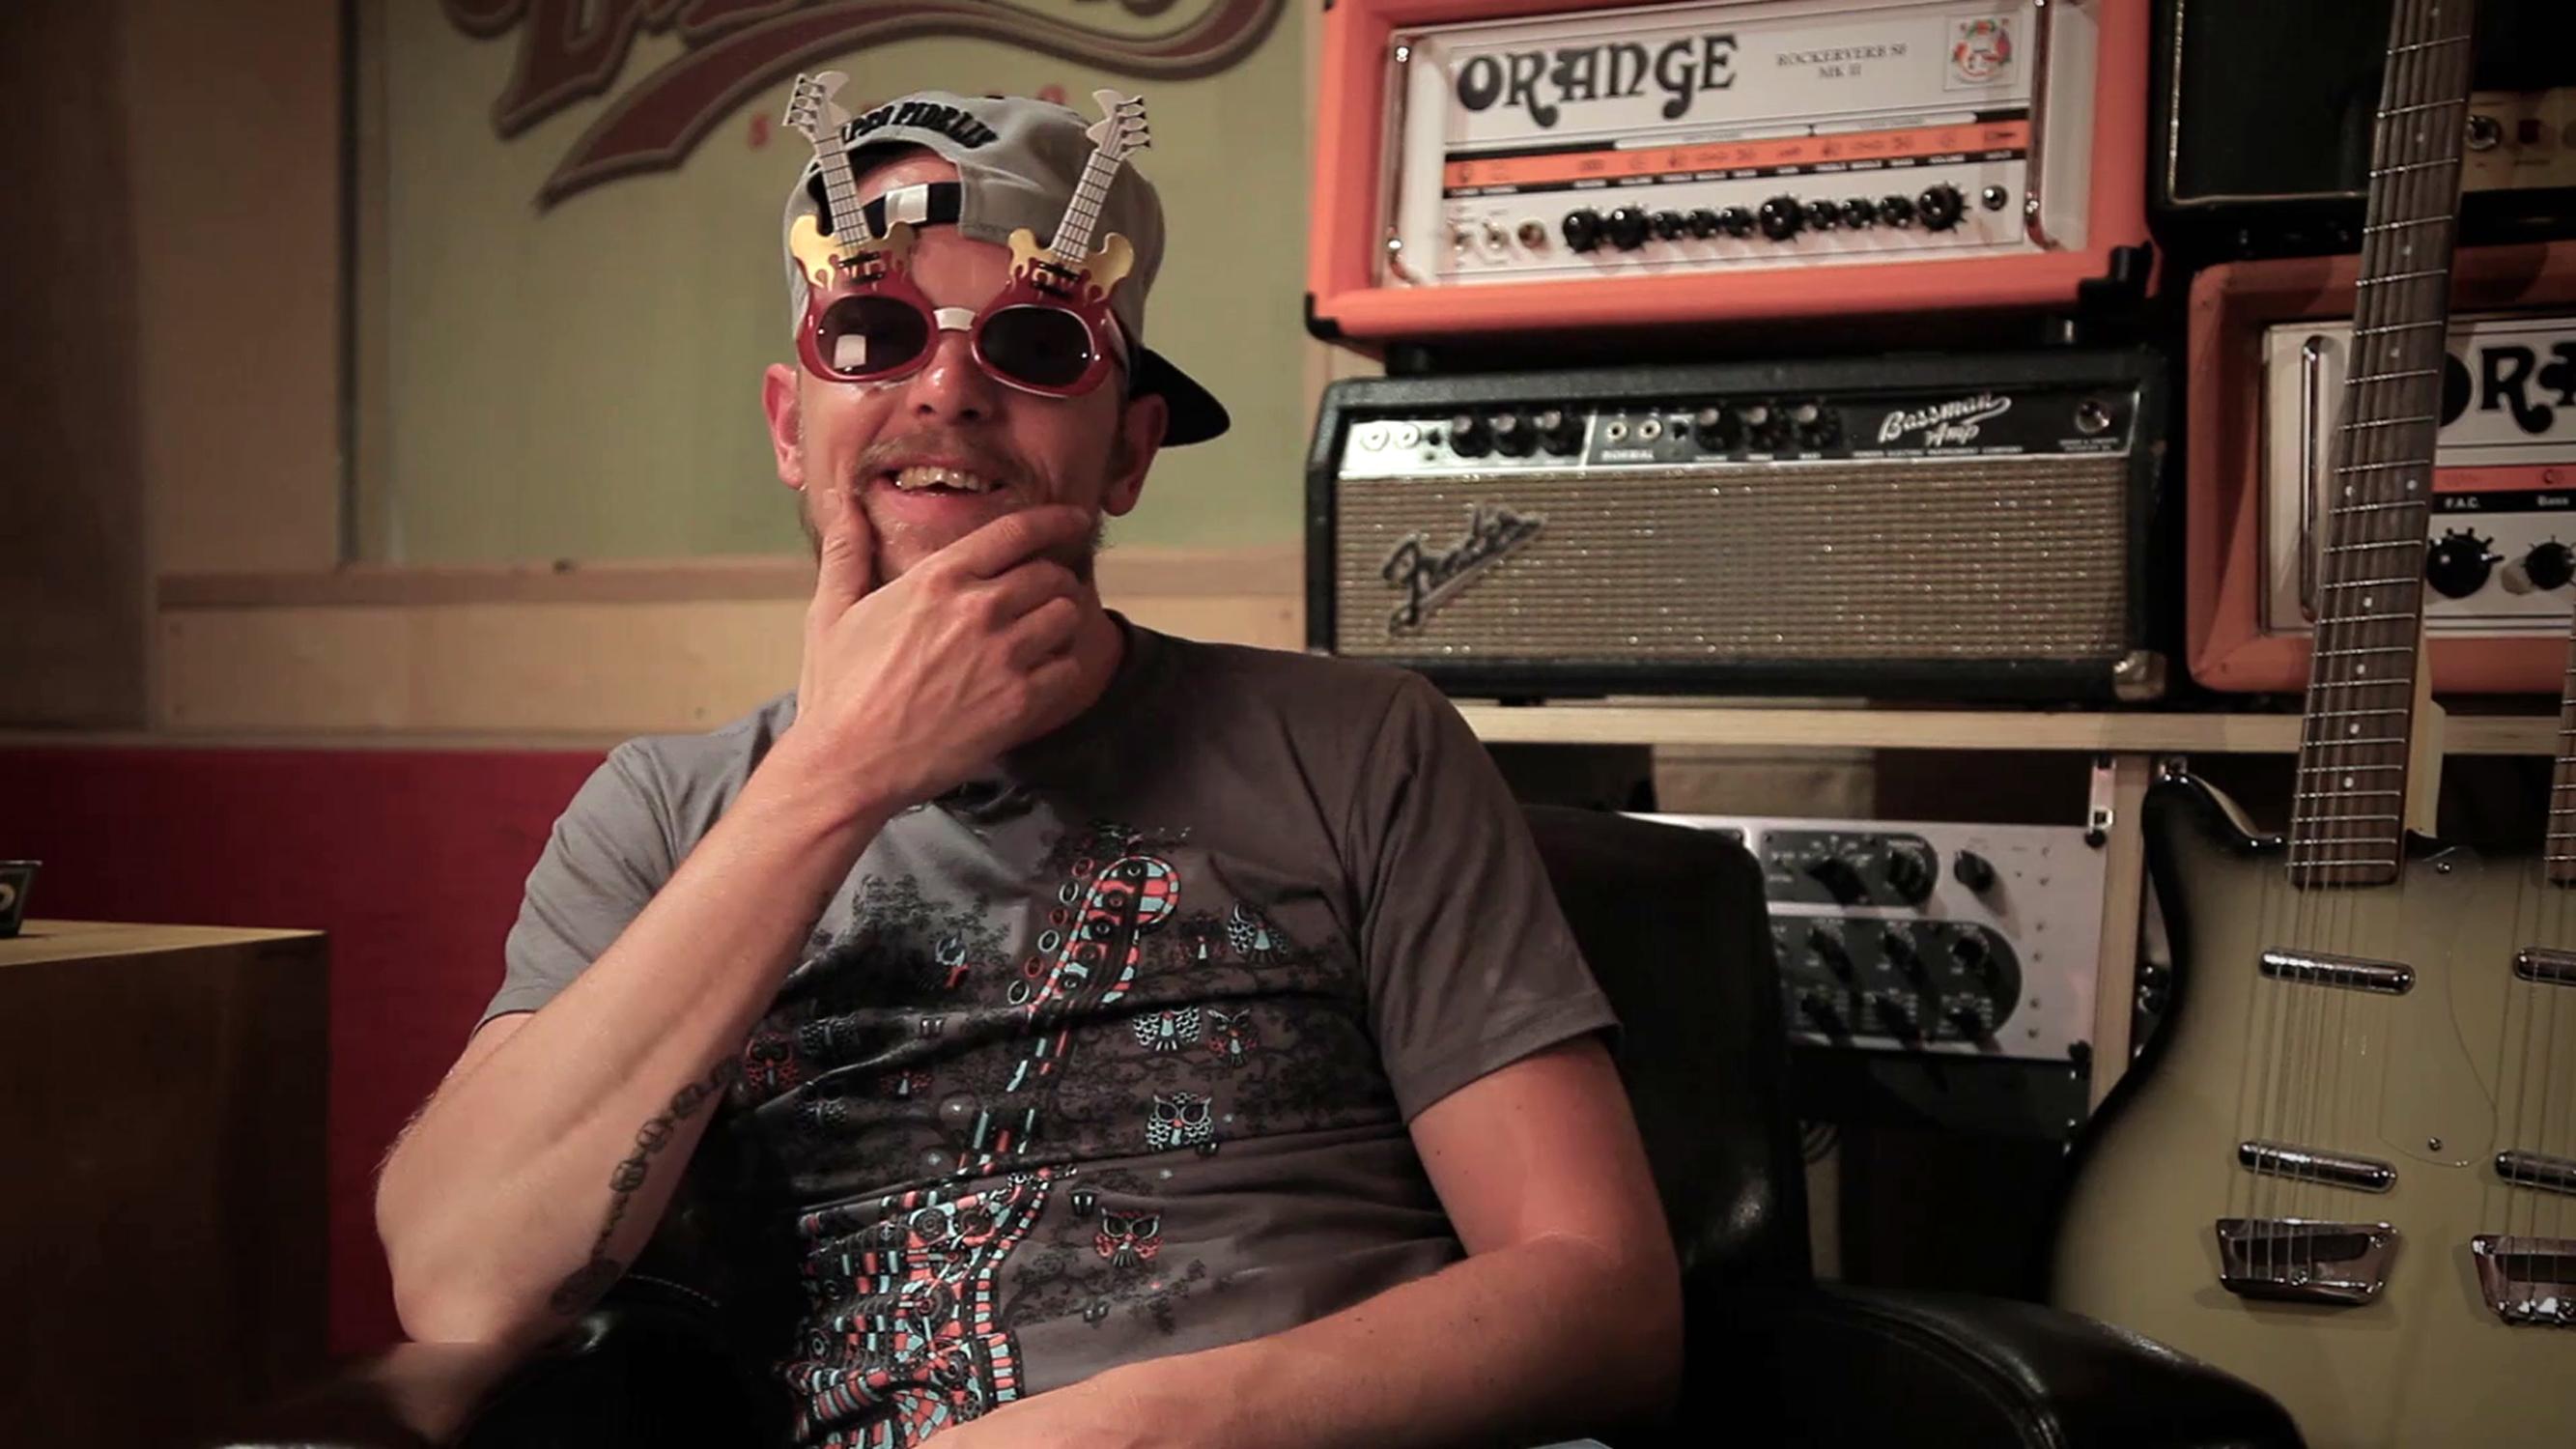 Jan Delay, Hammer & Michel - Albumtrailer